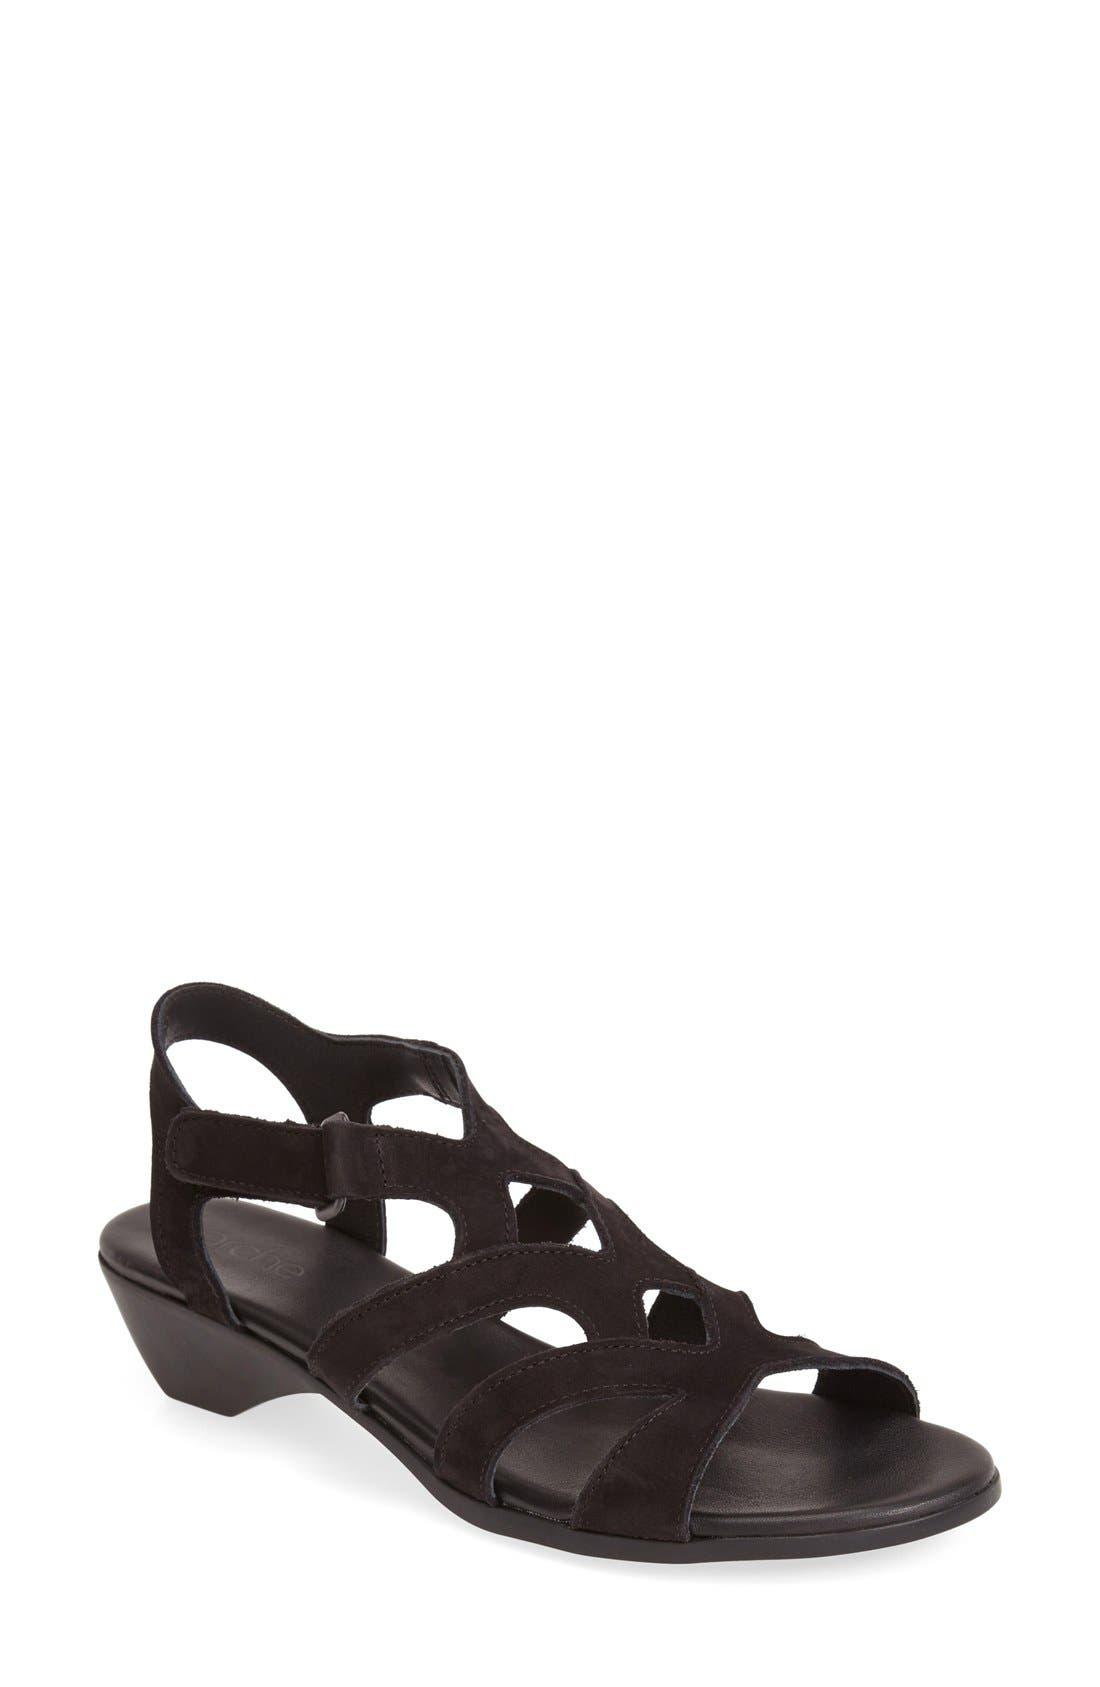 'Obela' Water Resistant Leather Sandal,                             Main thumbnail 2, color,